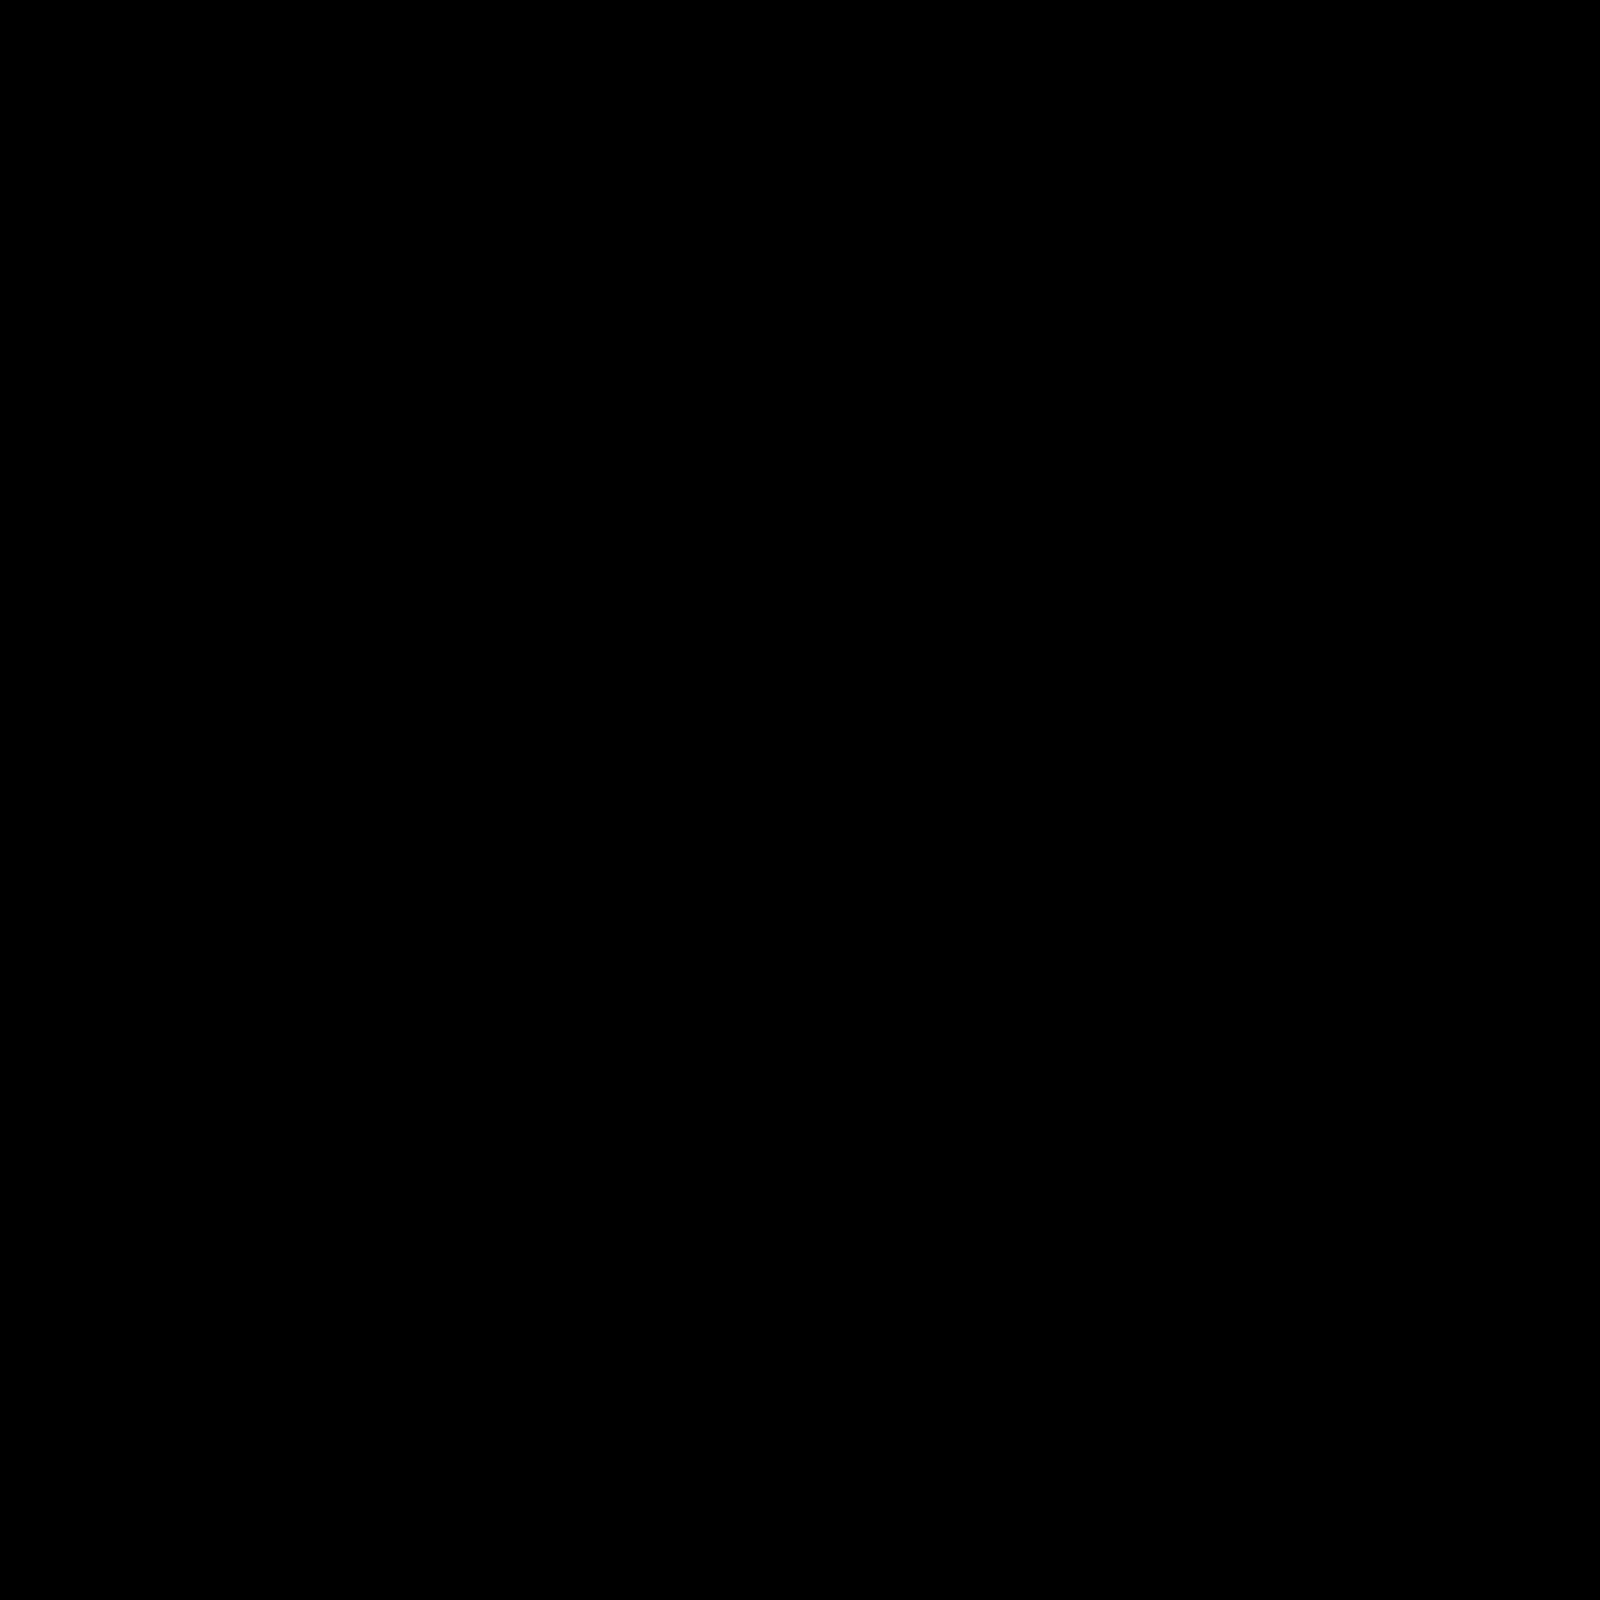 Lederhosen Filled icon